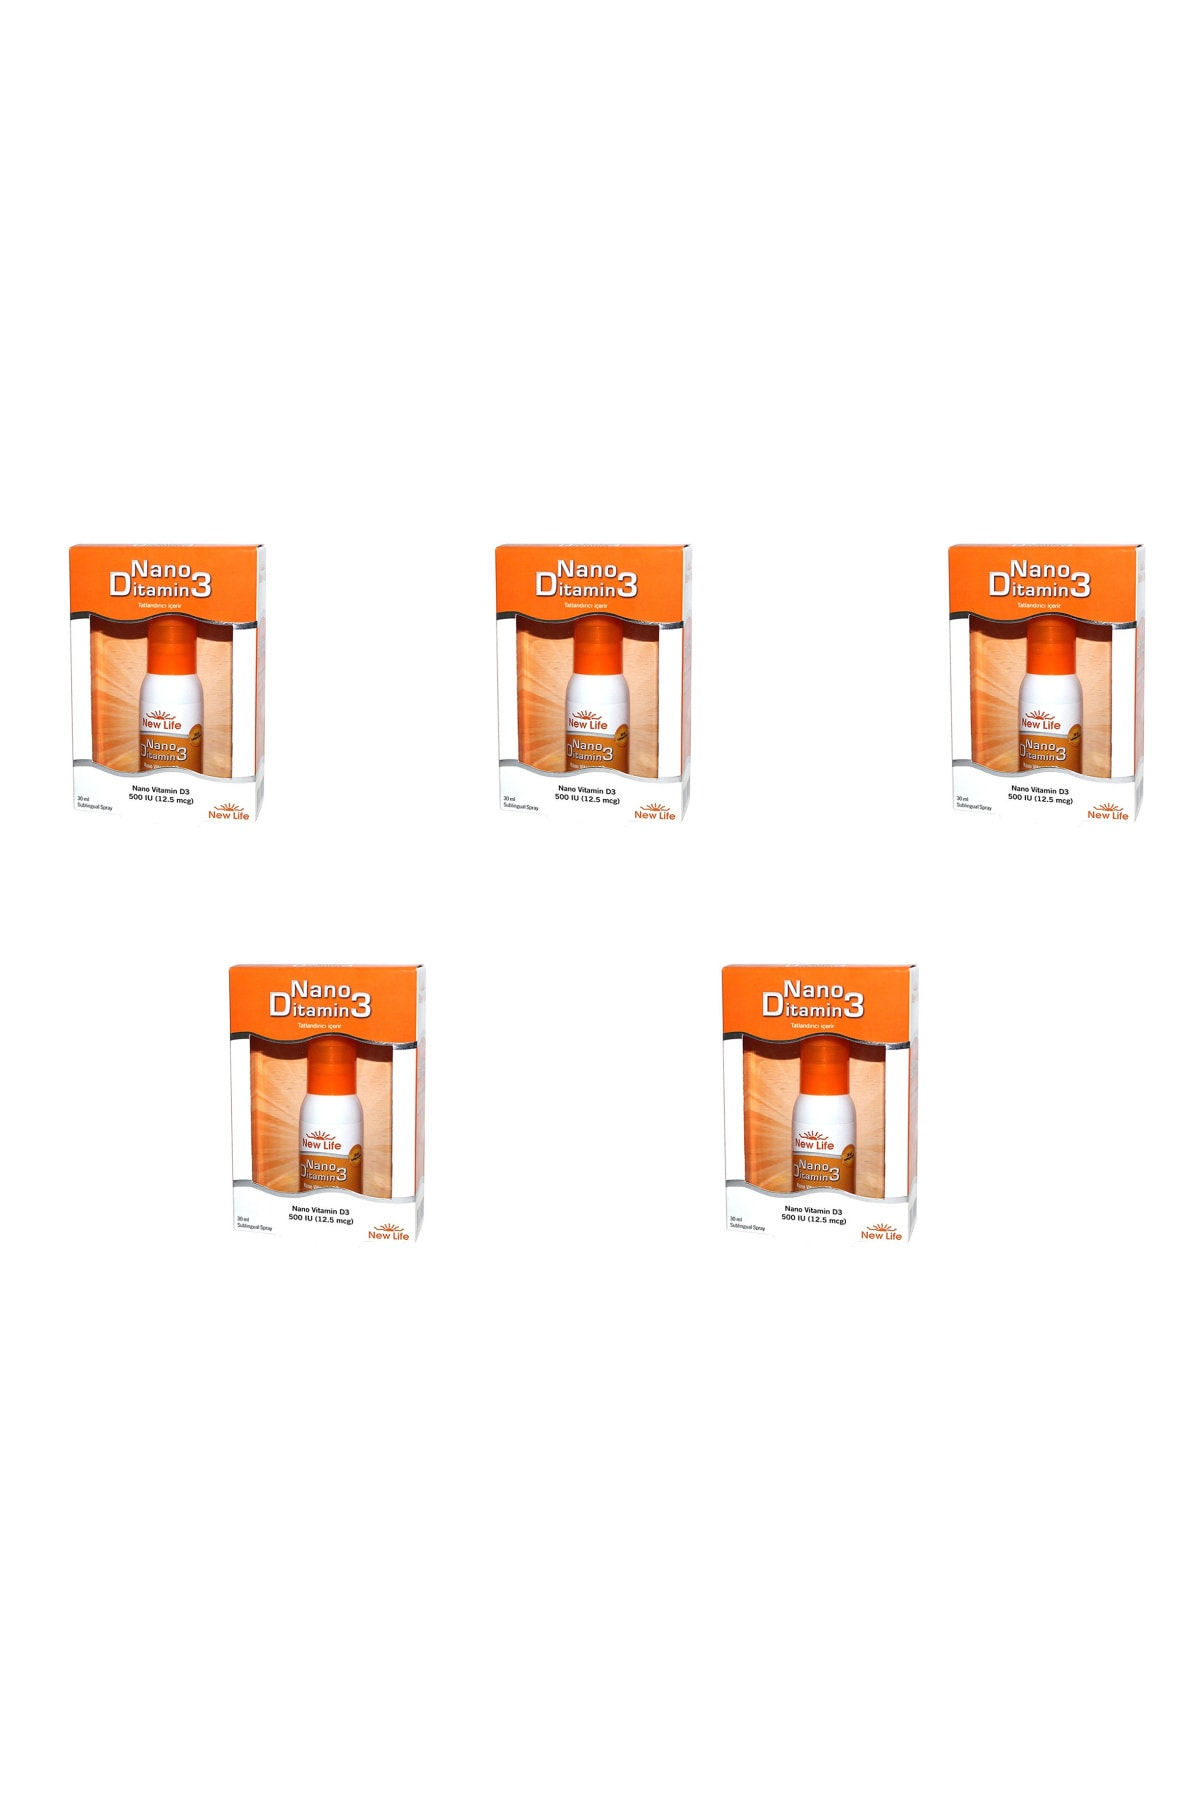 New Life Nano Ditamin D3 D Vitamini 30 Ml 5'li Paket 1